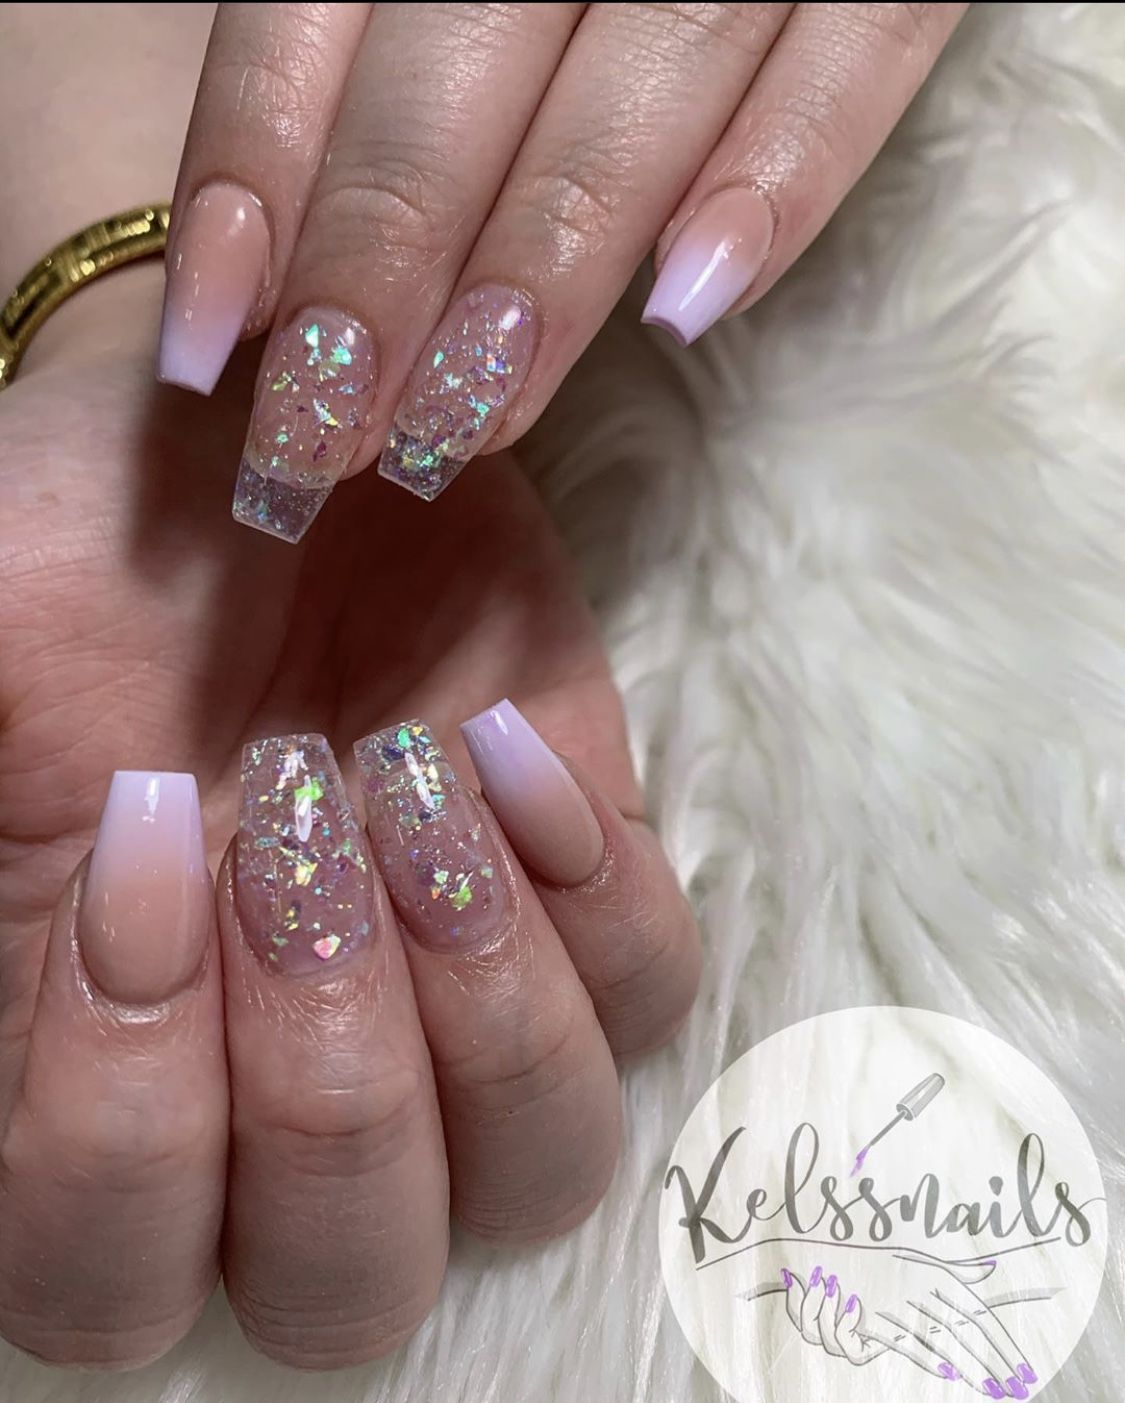 #glitter #nails #pink #nailart #nailtech